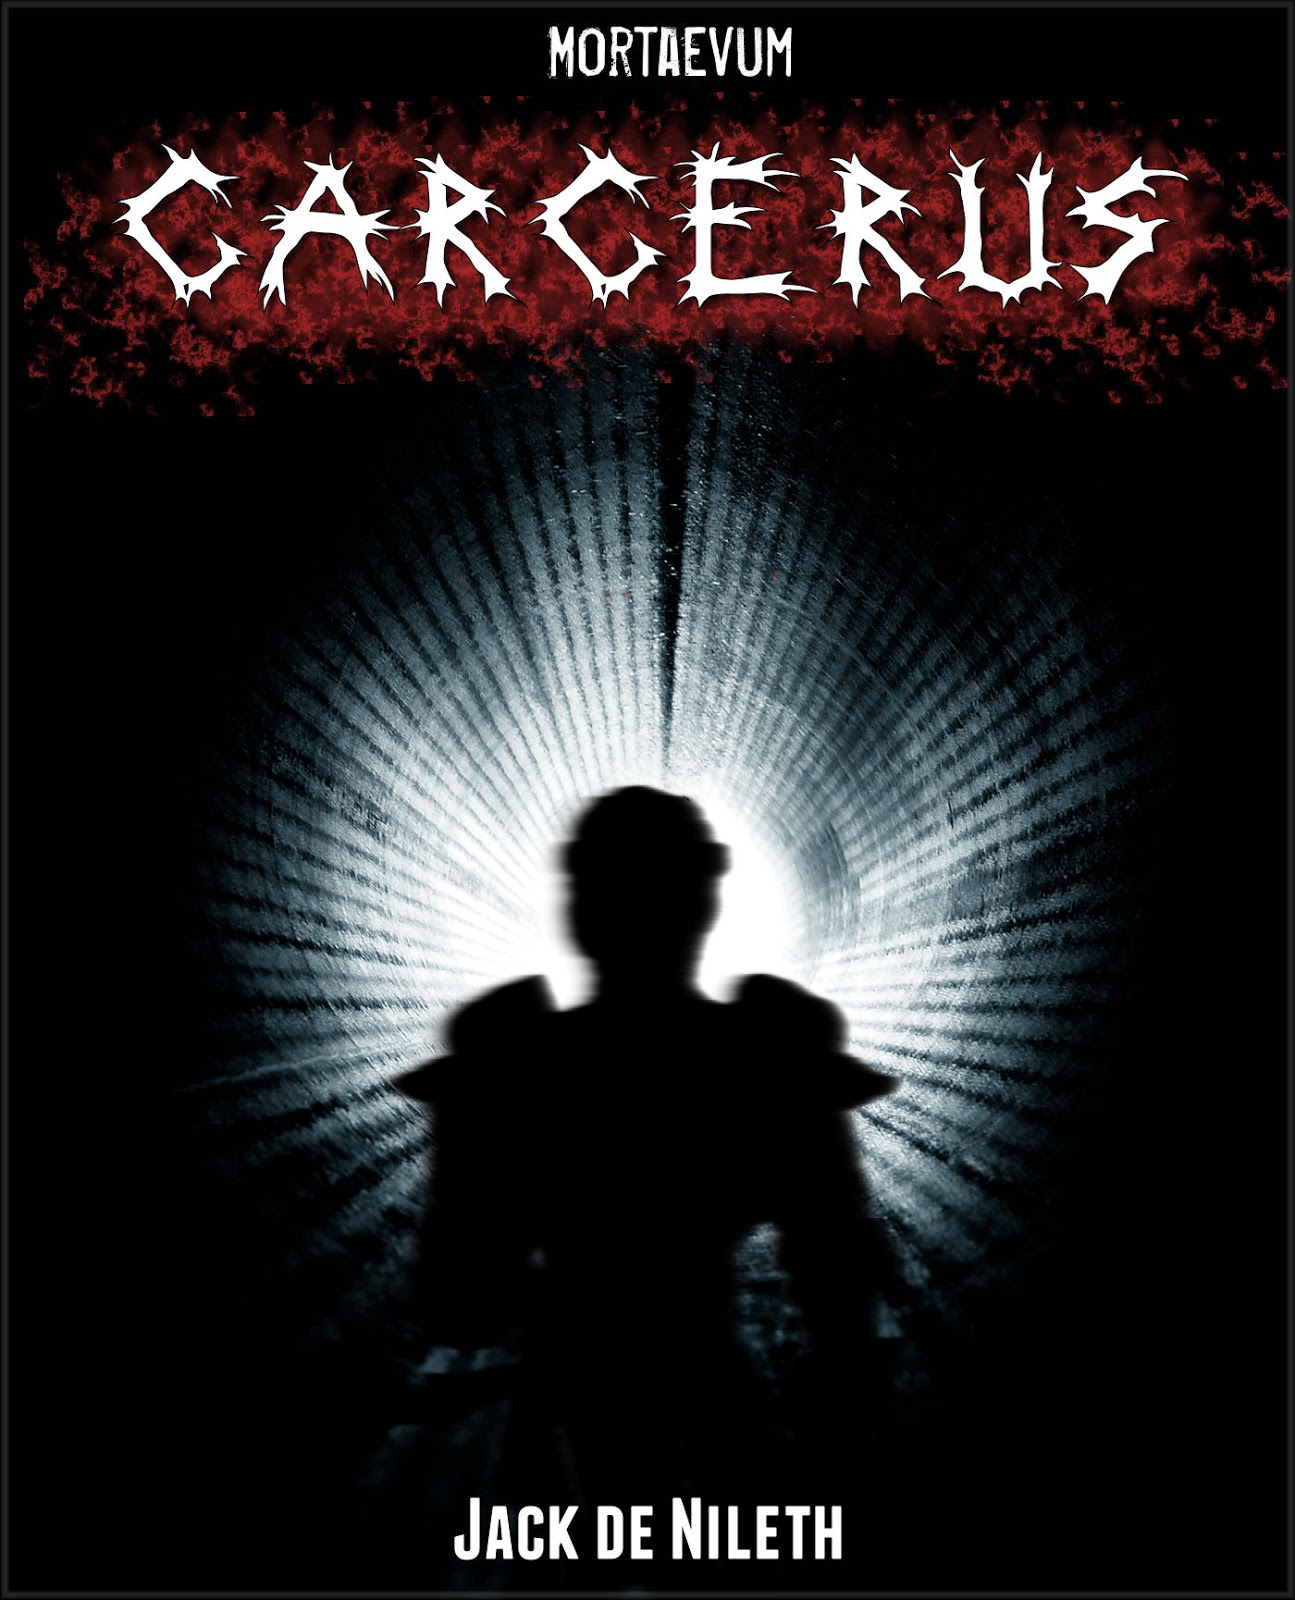 Carcerus